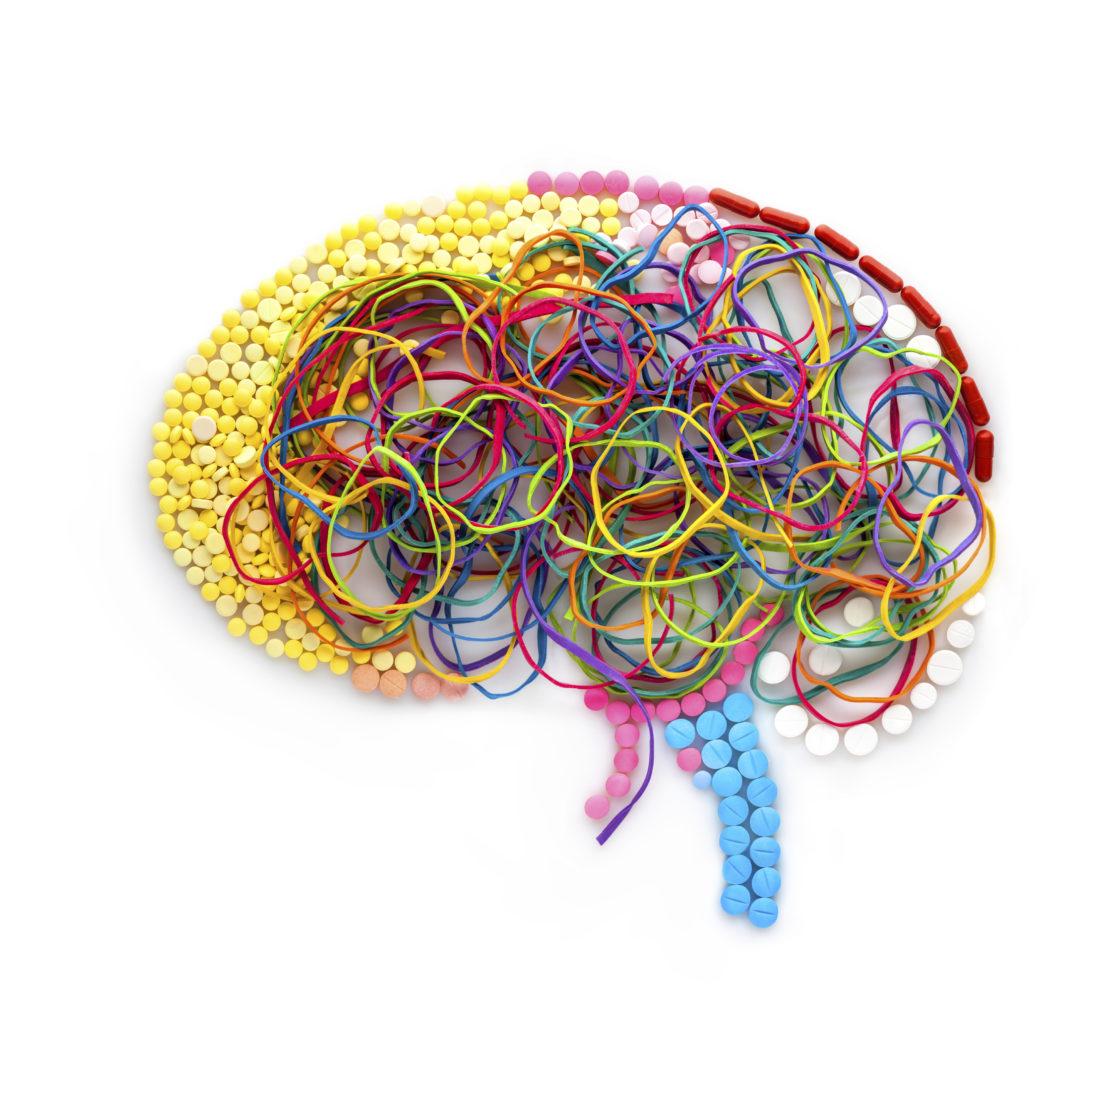 brain-pills-addiction-memory-mind-iStock_000066194687_Large-1-e1500997220509.jpeg